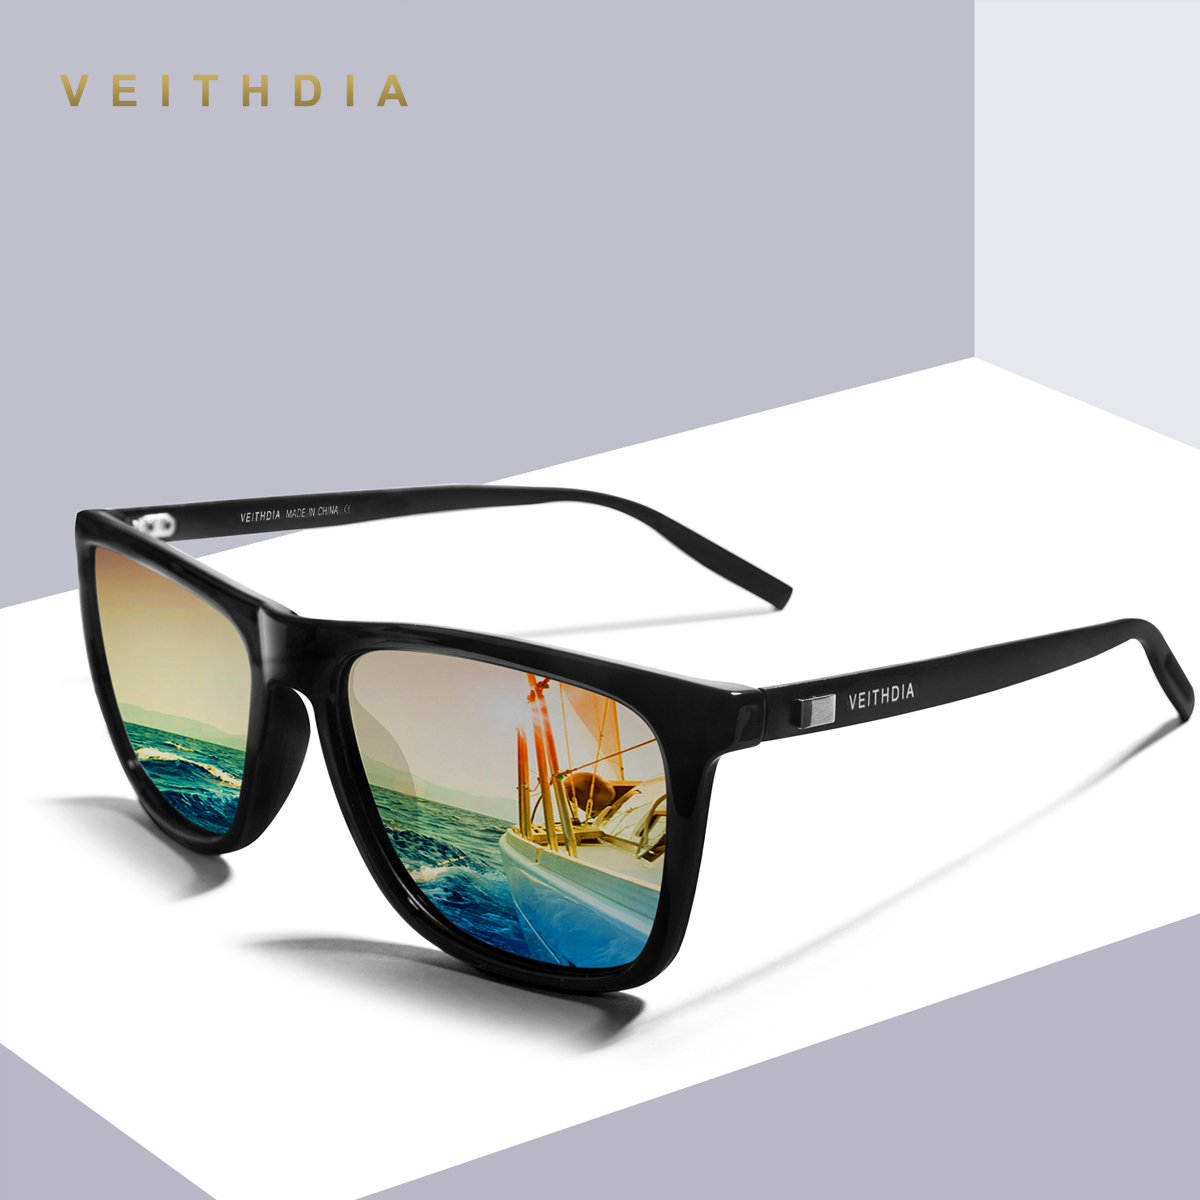 Lentes polarizados marca Unisex Retro de aluminio + TR90 cuadrado gafas de  sol polarizadas lente gafas 248fecbf40